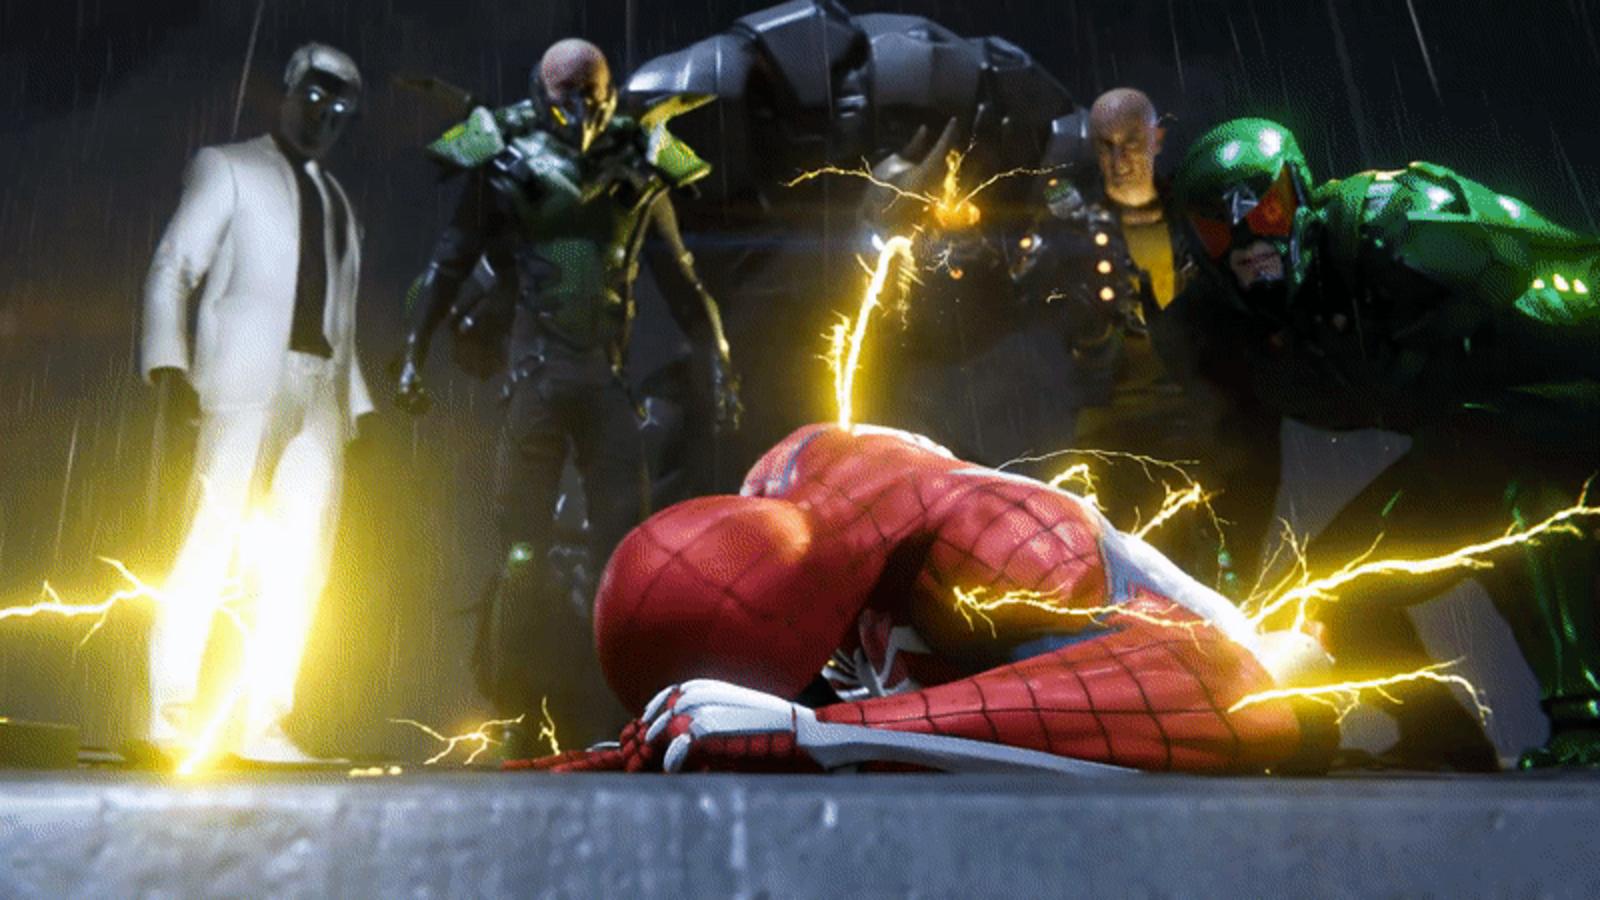 Is Spider-Man 4 worth buying? - Quora